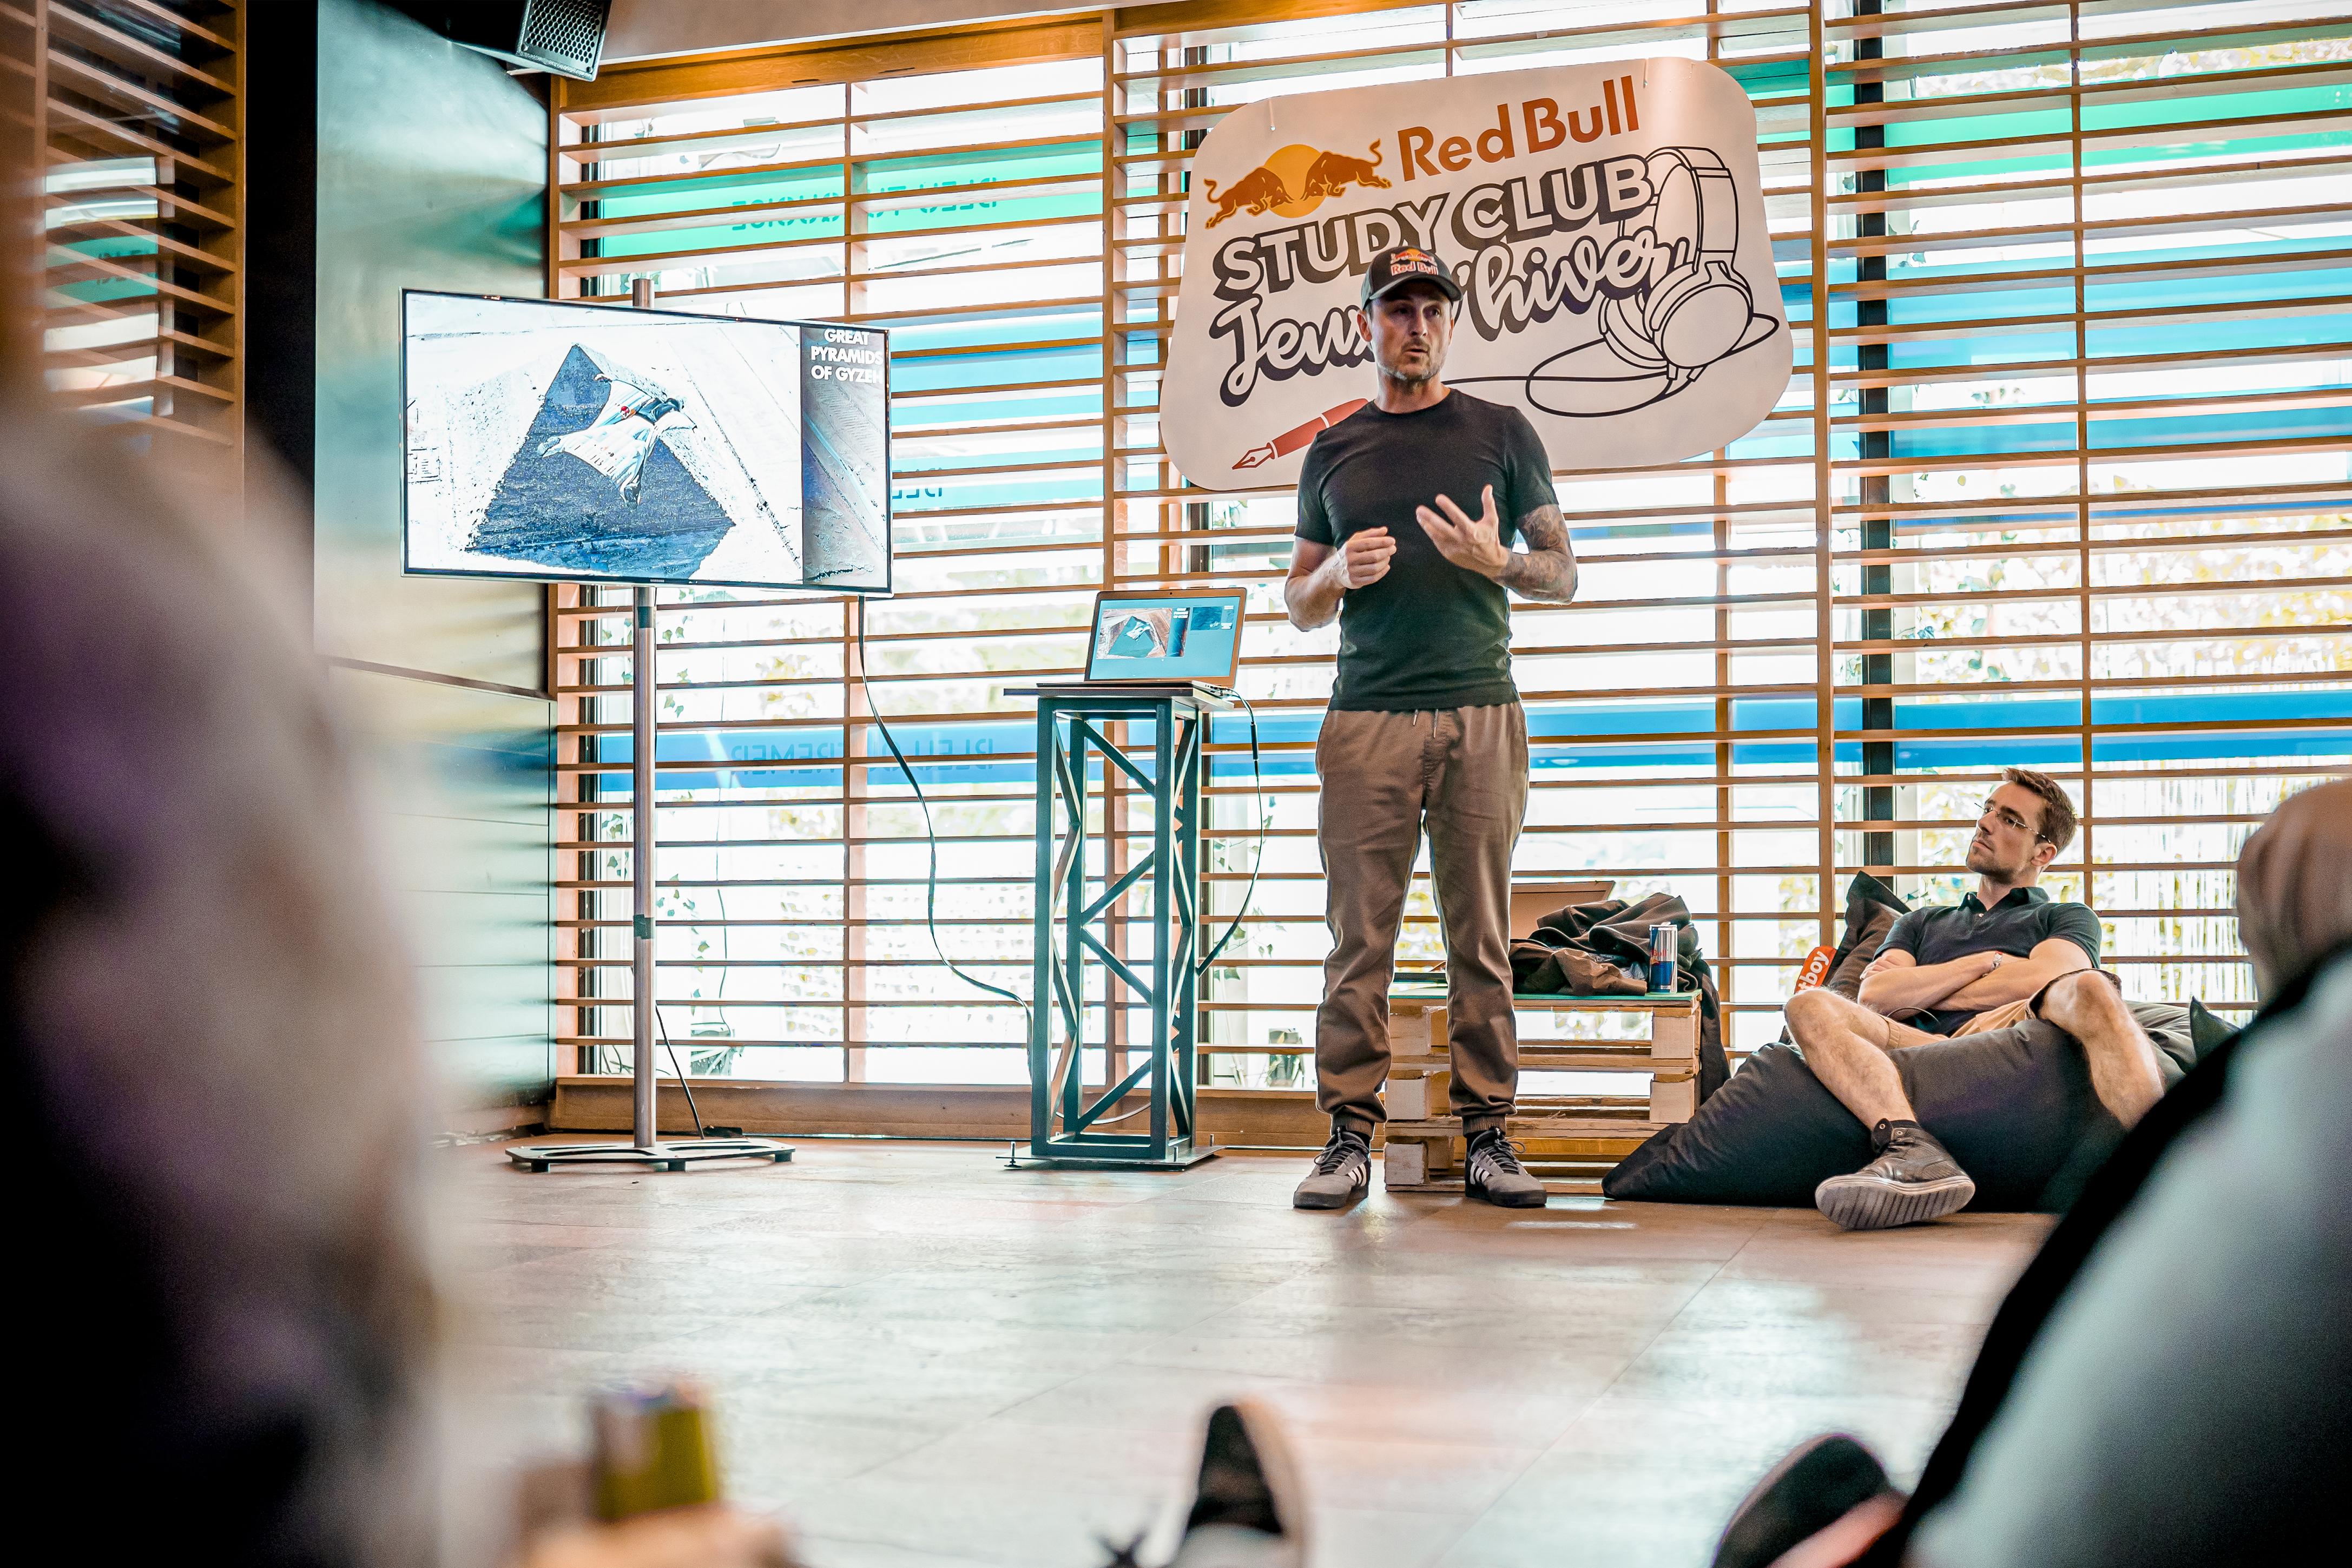 Red Bull - Study Club